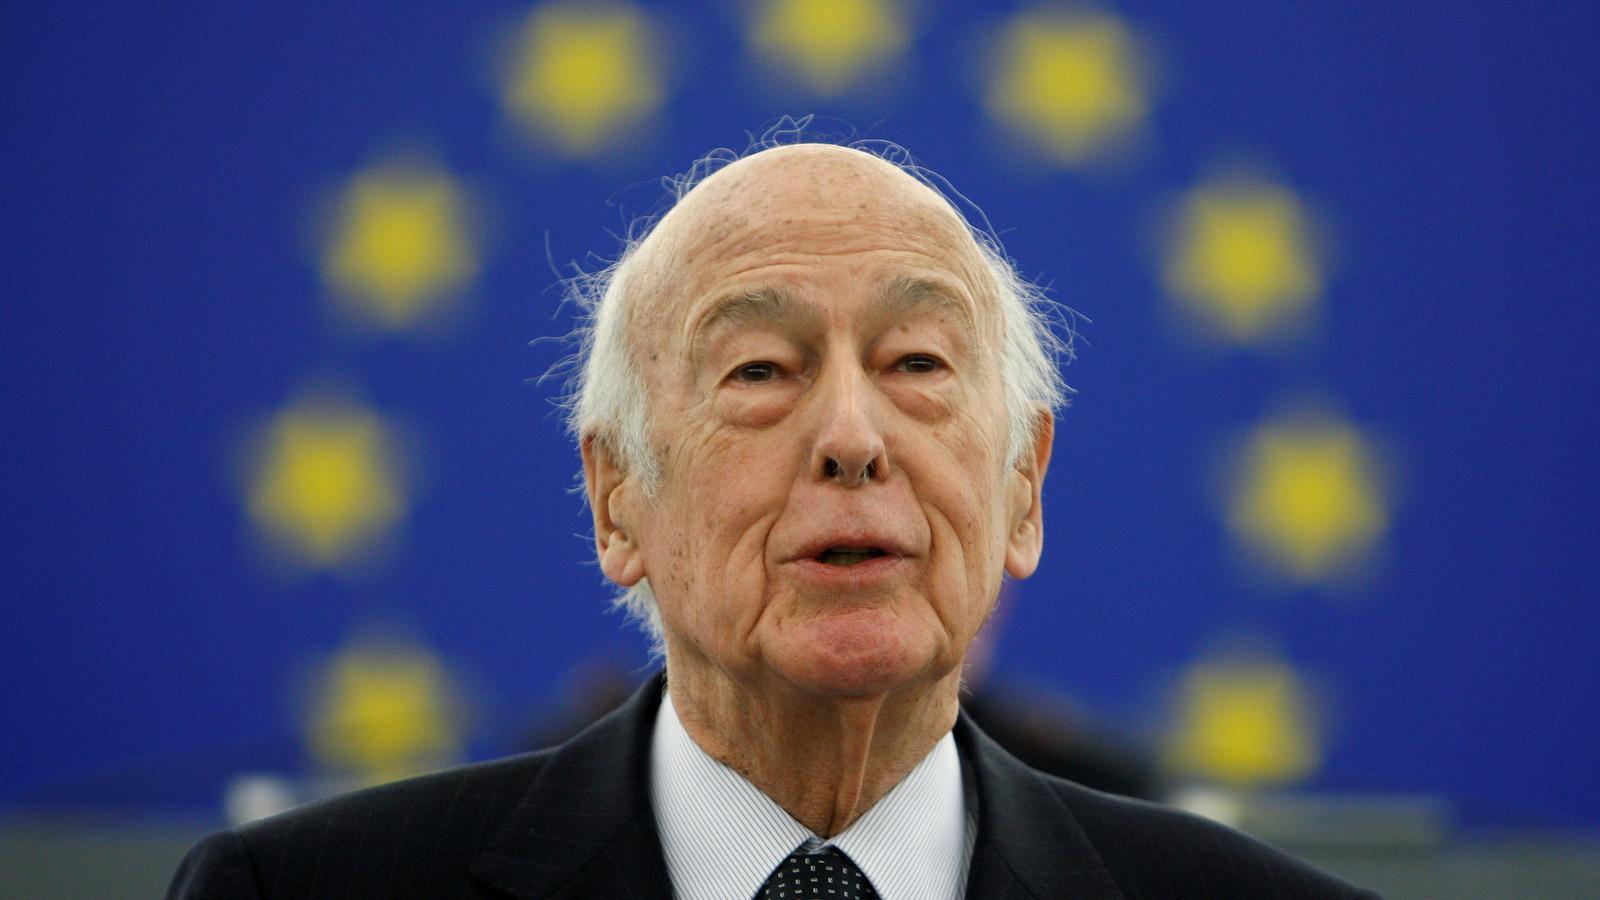 L'expresident francès Valéry Giscard d'Estaing